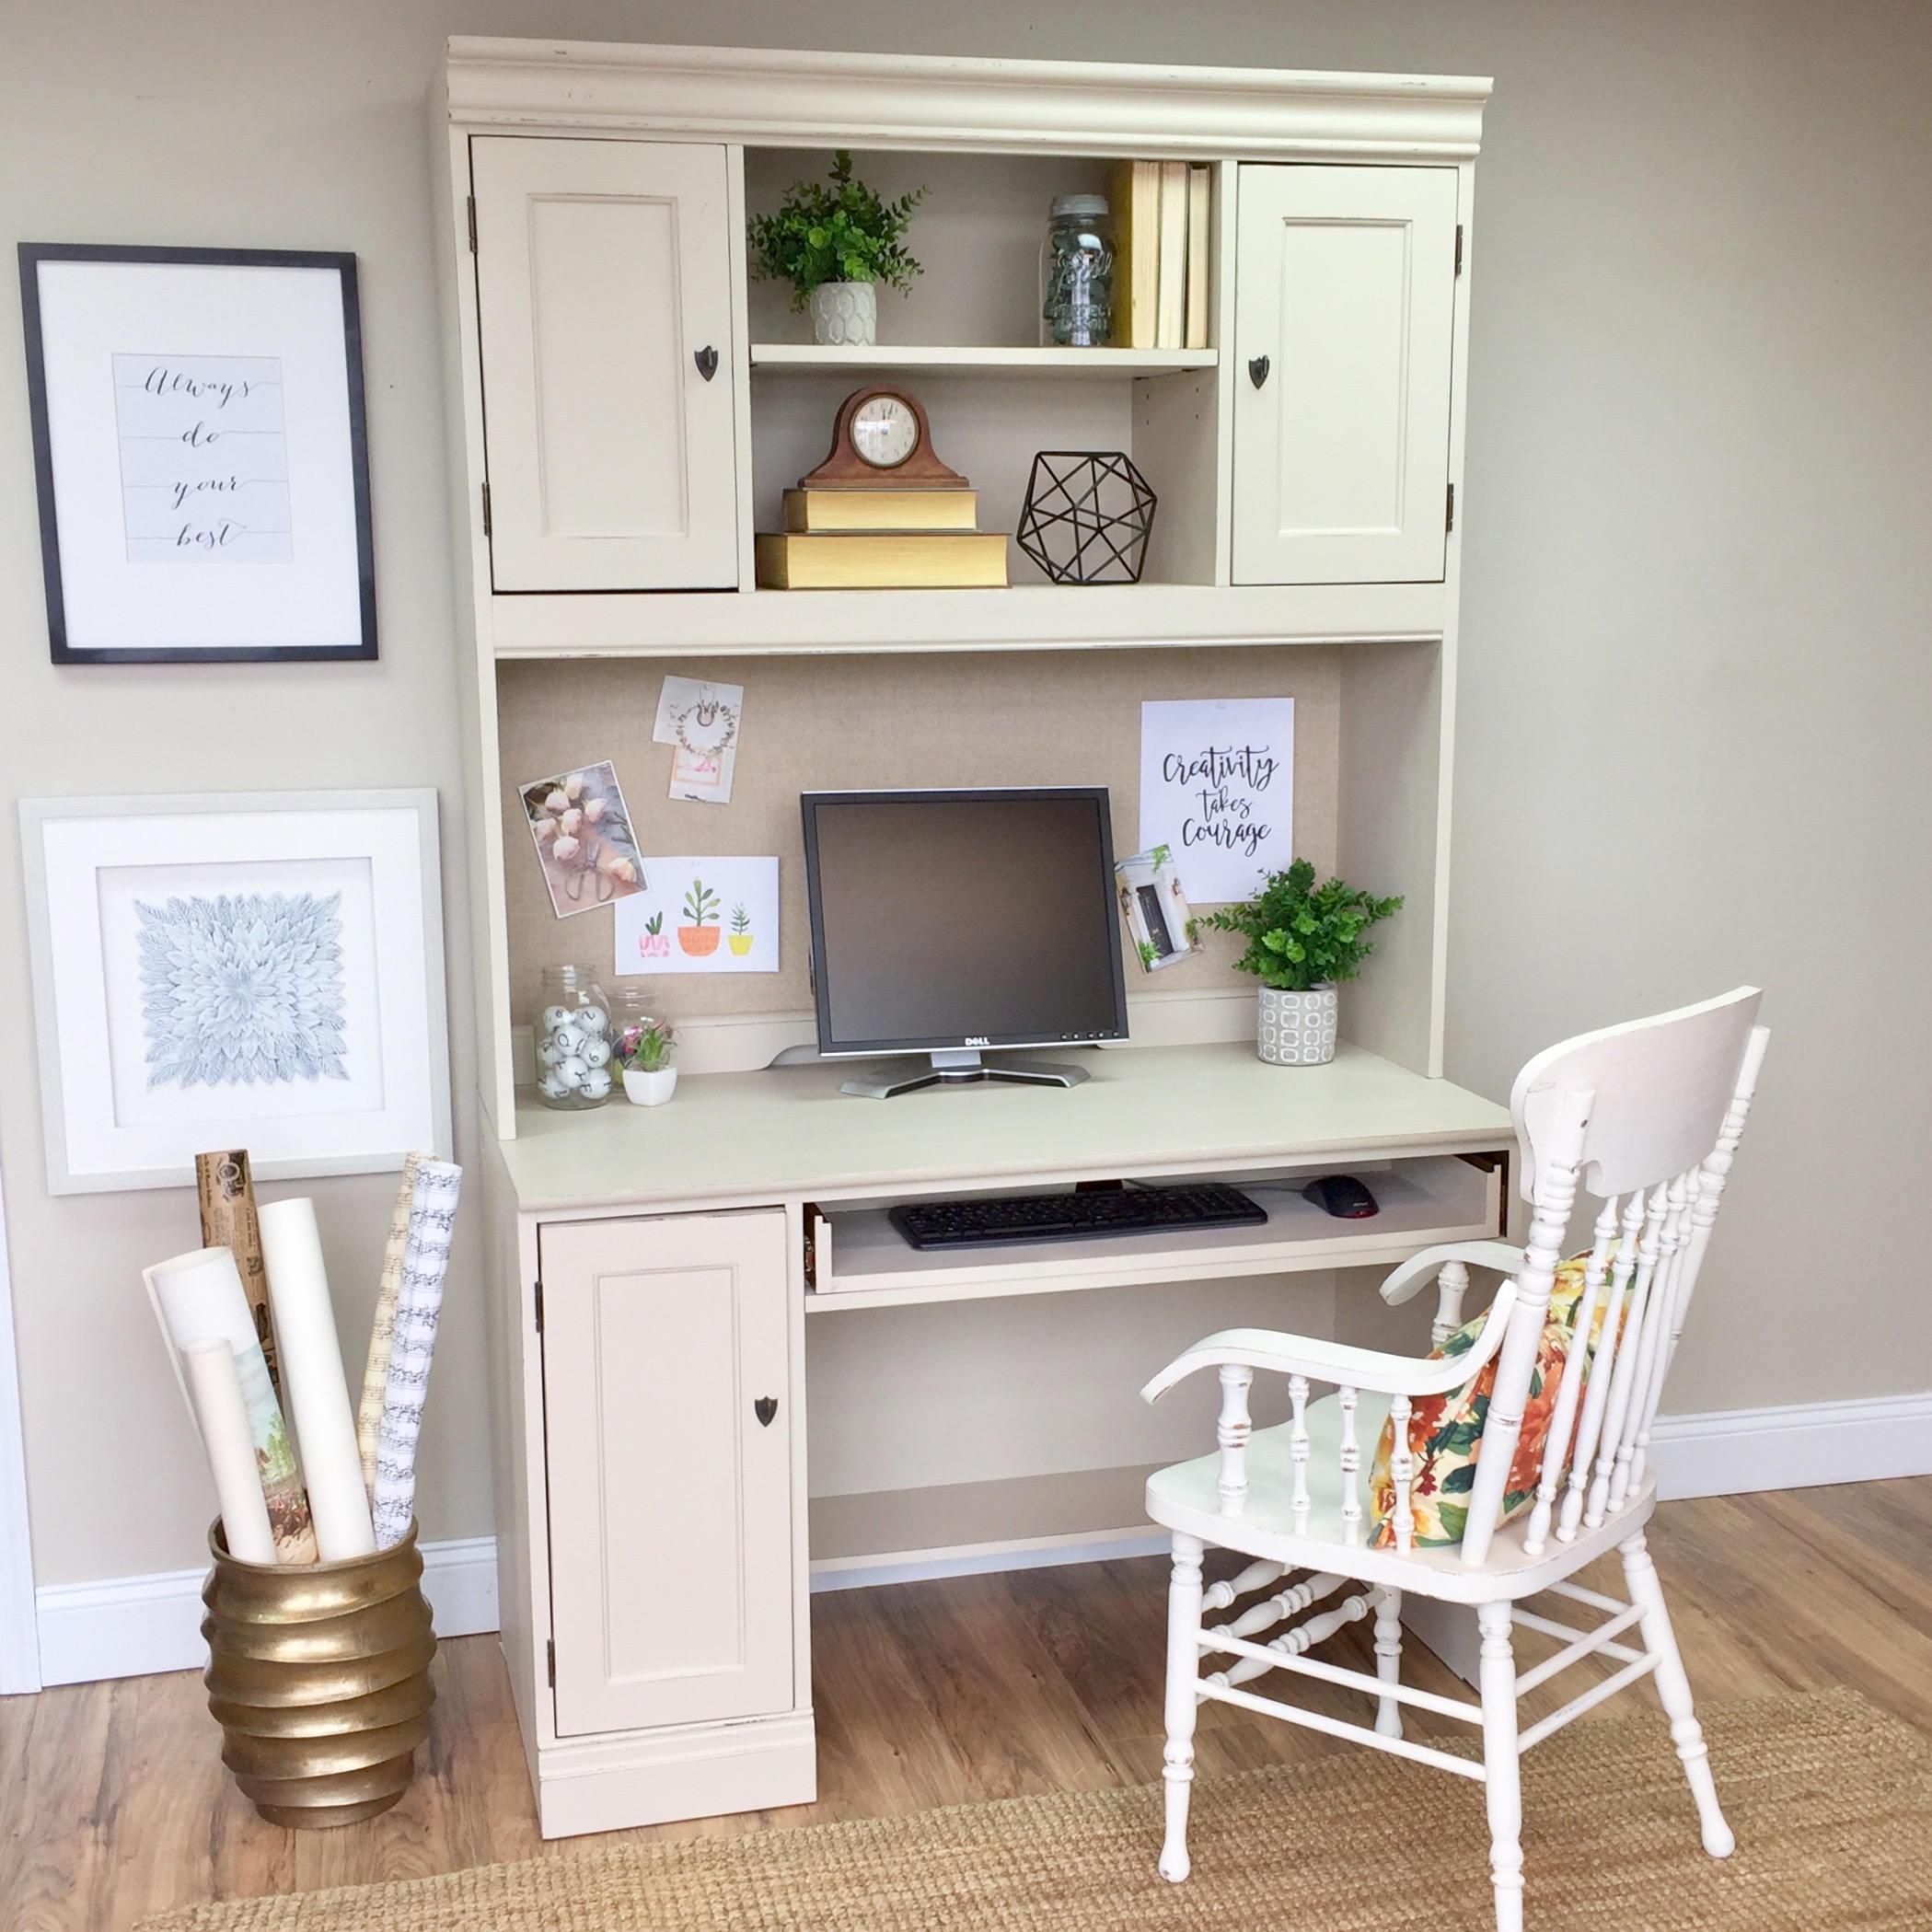 Hutch Desk   White Desk With Hutch   Home Office Furniture   Hooker Furniture  Desk   Computer Desk With Hutch   Distressed Furniture